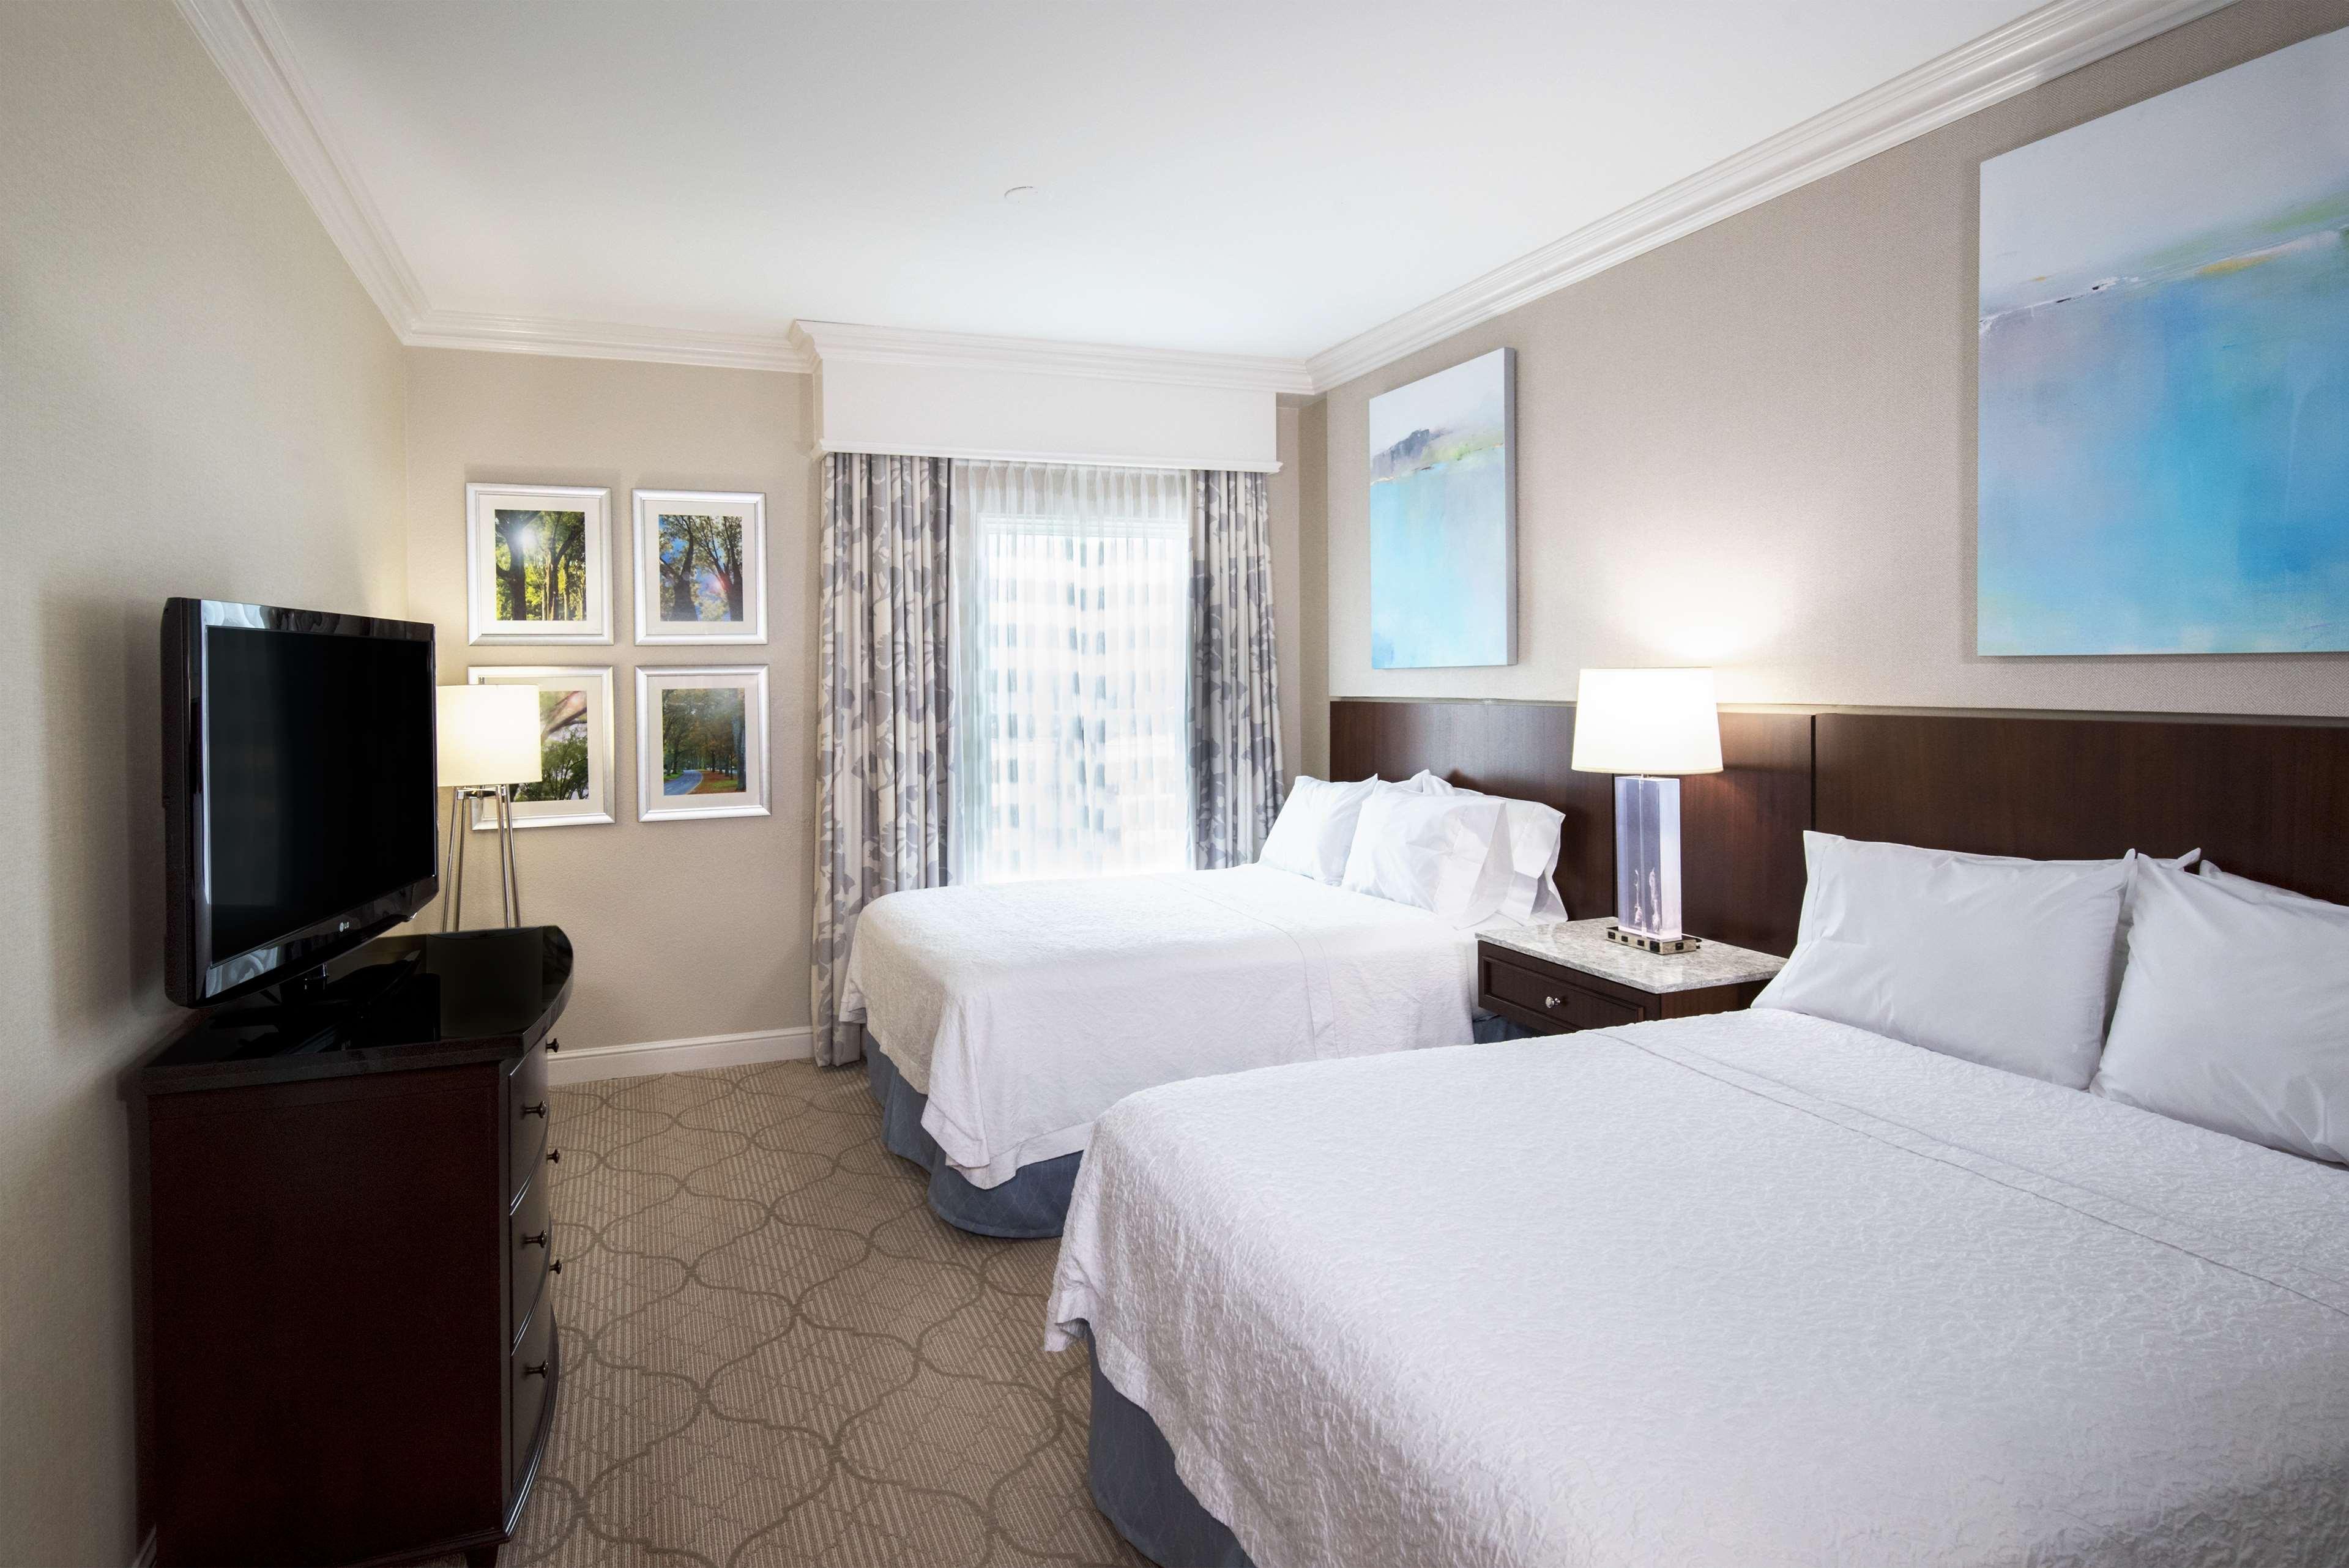 Hampton Inn & Suites Charlotte/South Park at Phillips Place image 41